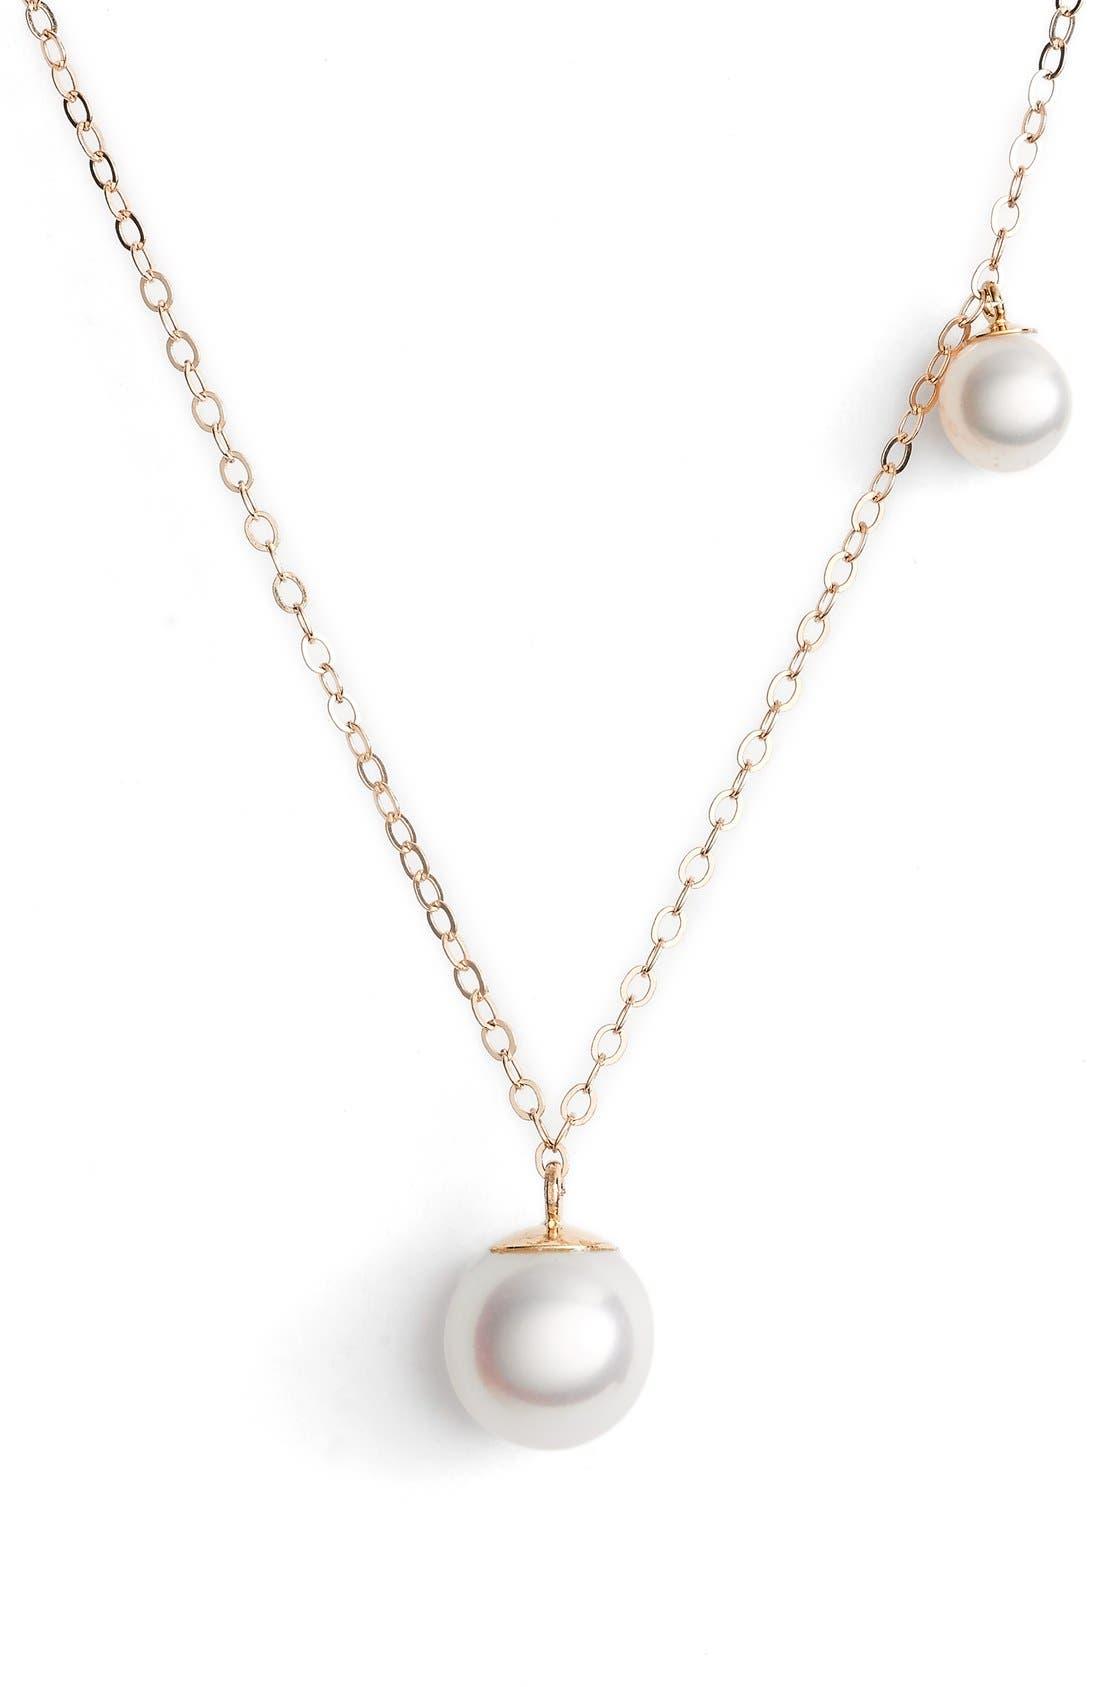 Double Pearl Pendant Necklace,                             Main thumbnail 1, color,                             700